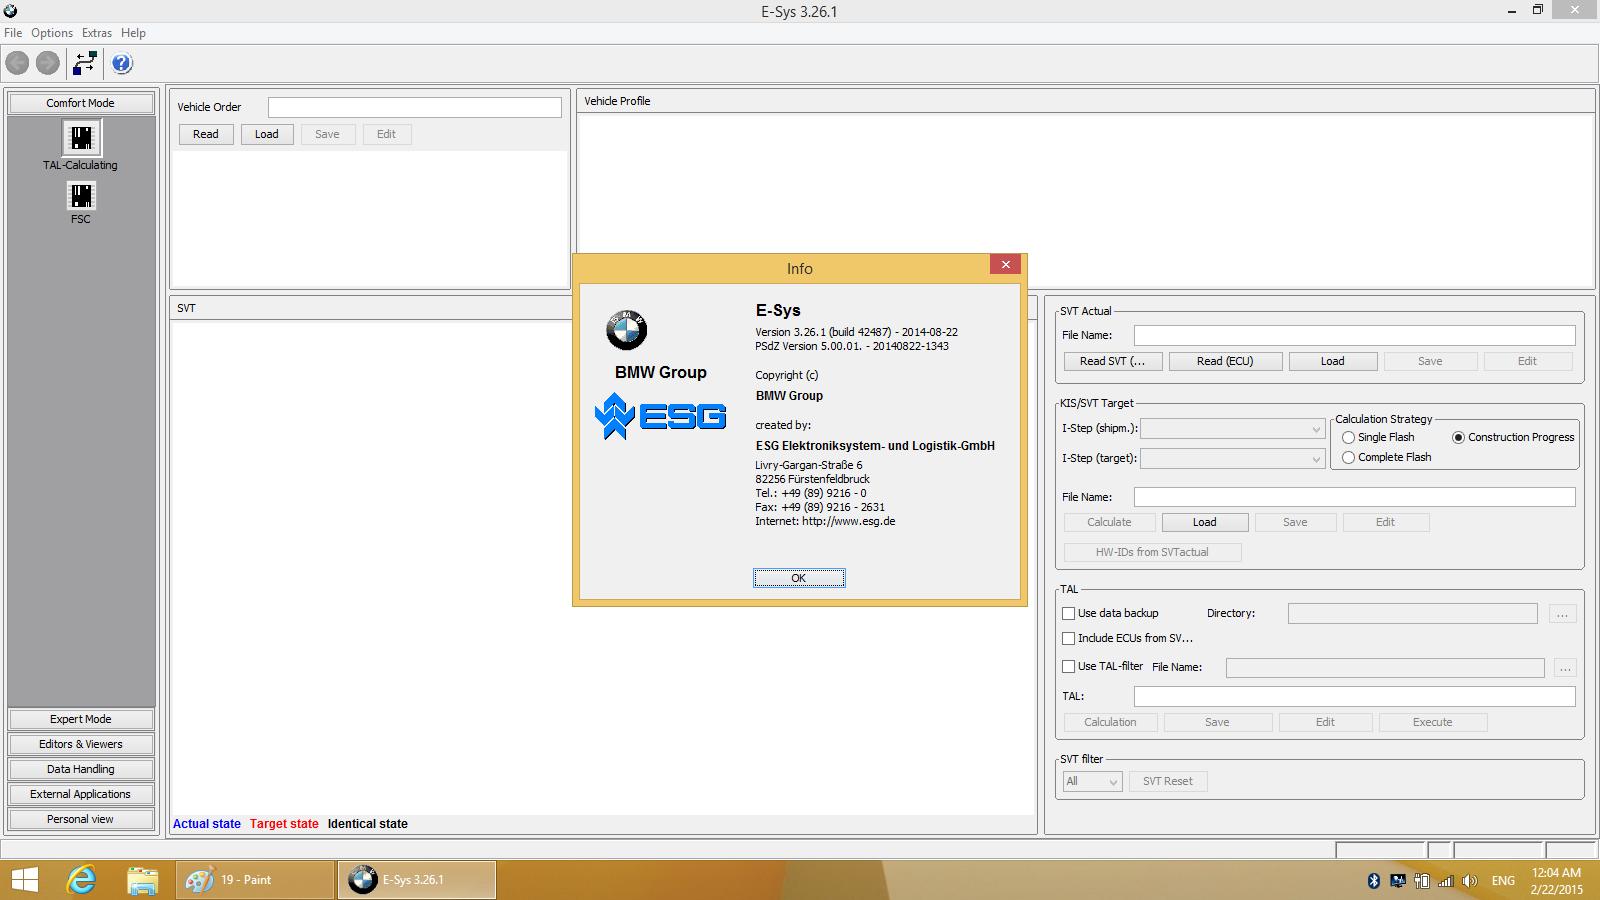 Super iCOM ISPI NEXT Esys 3.26.1